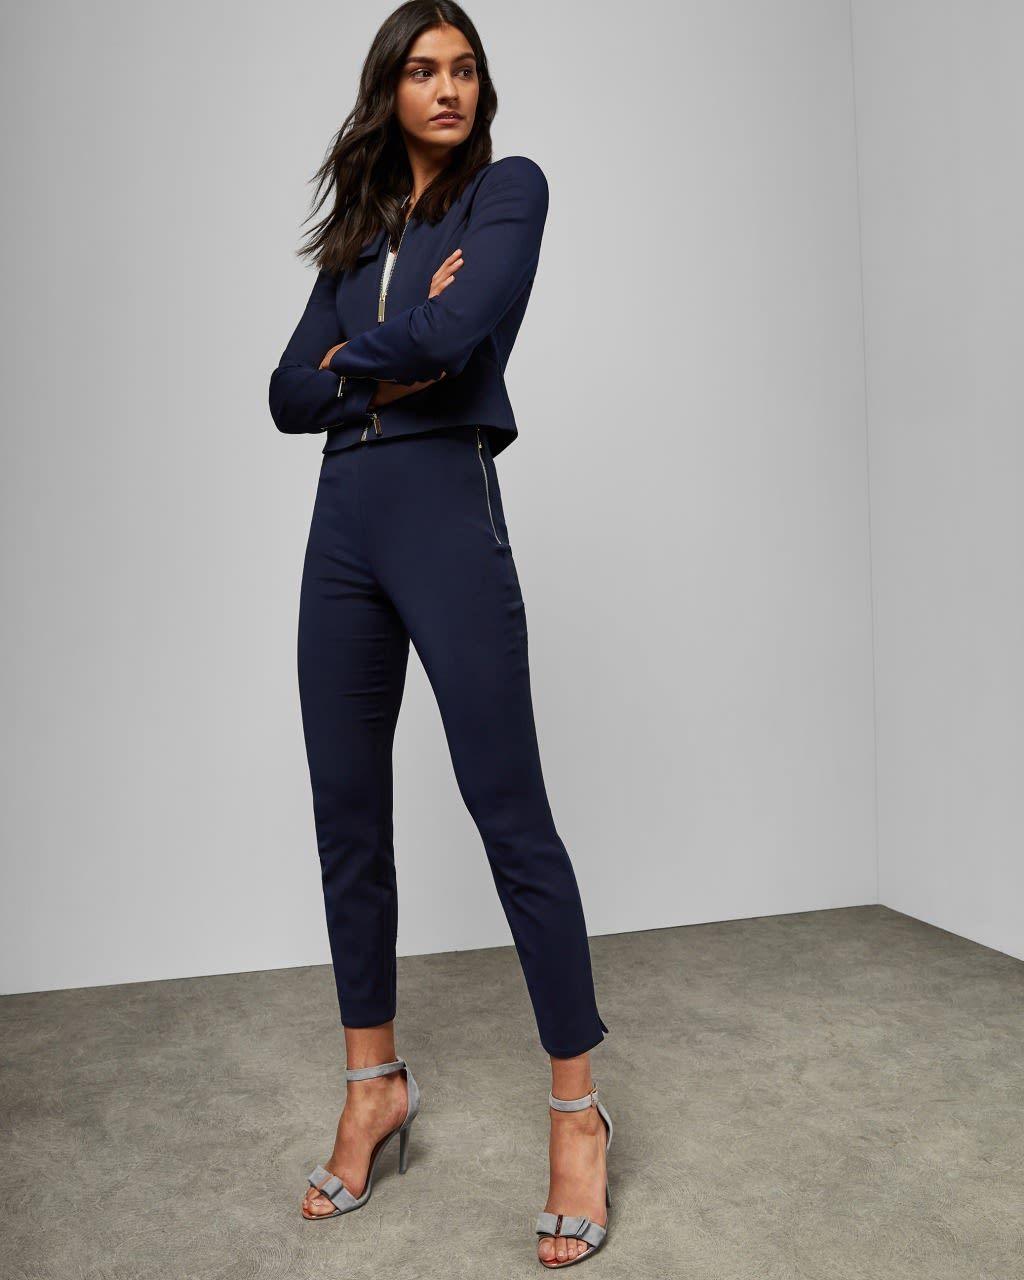 Women's Designer Clothing & Fashion | Ted Baker